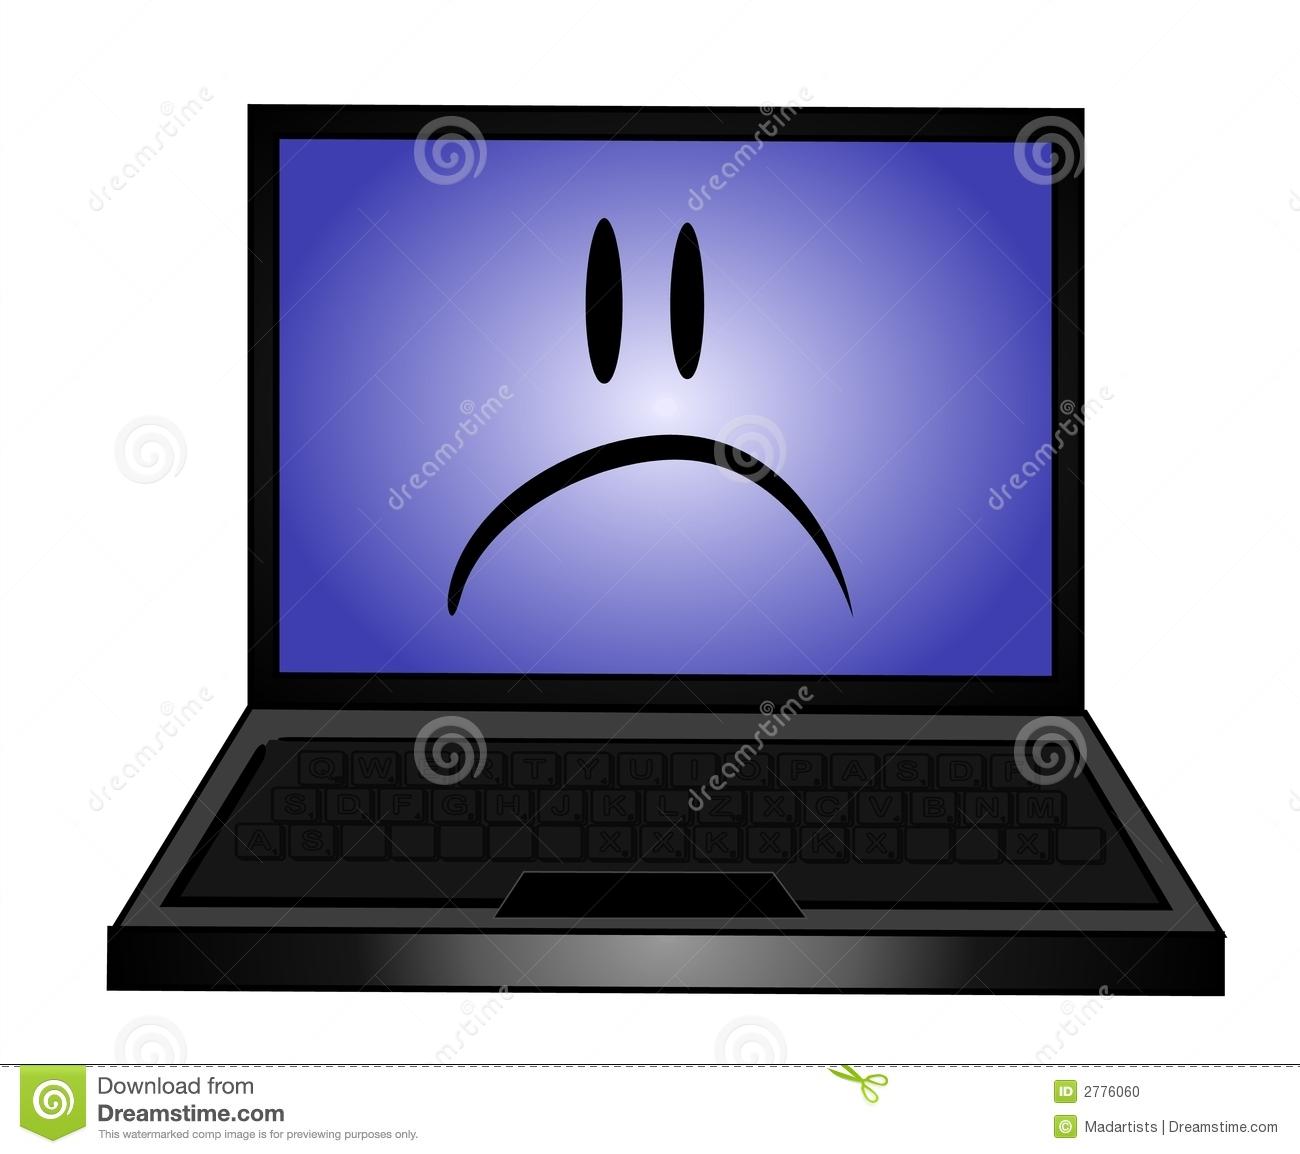 Computer vs laptop clipart jpg freeuse Sad Laptop Computer Clip Art Stock Photo - Image: 2776060 jpg freeuse